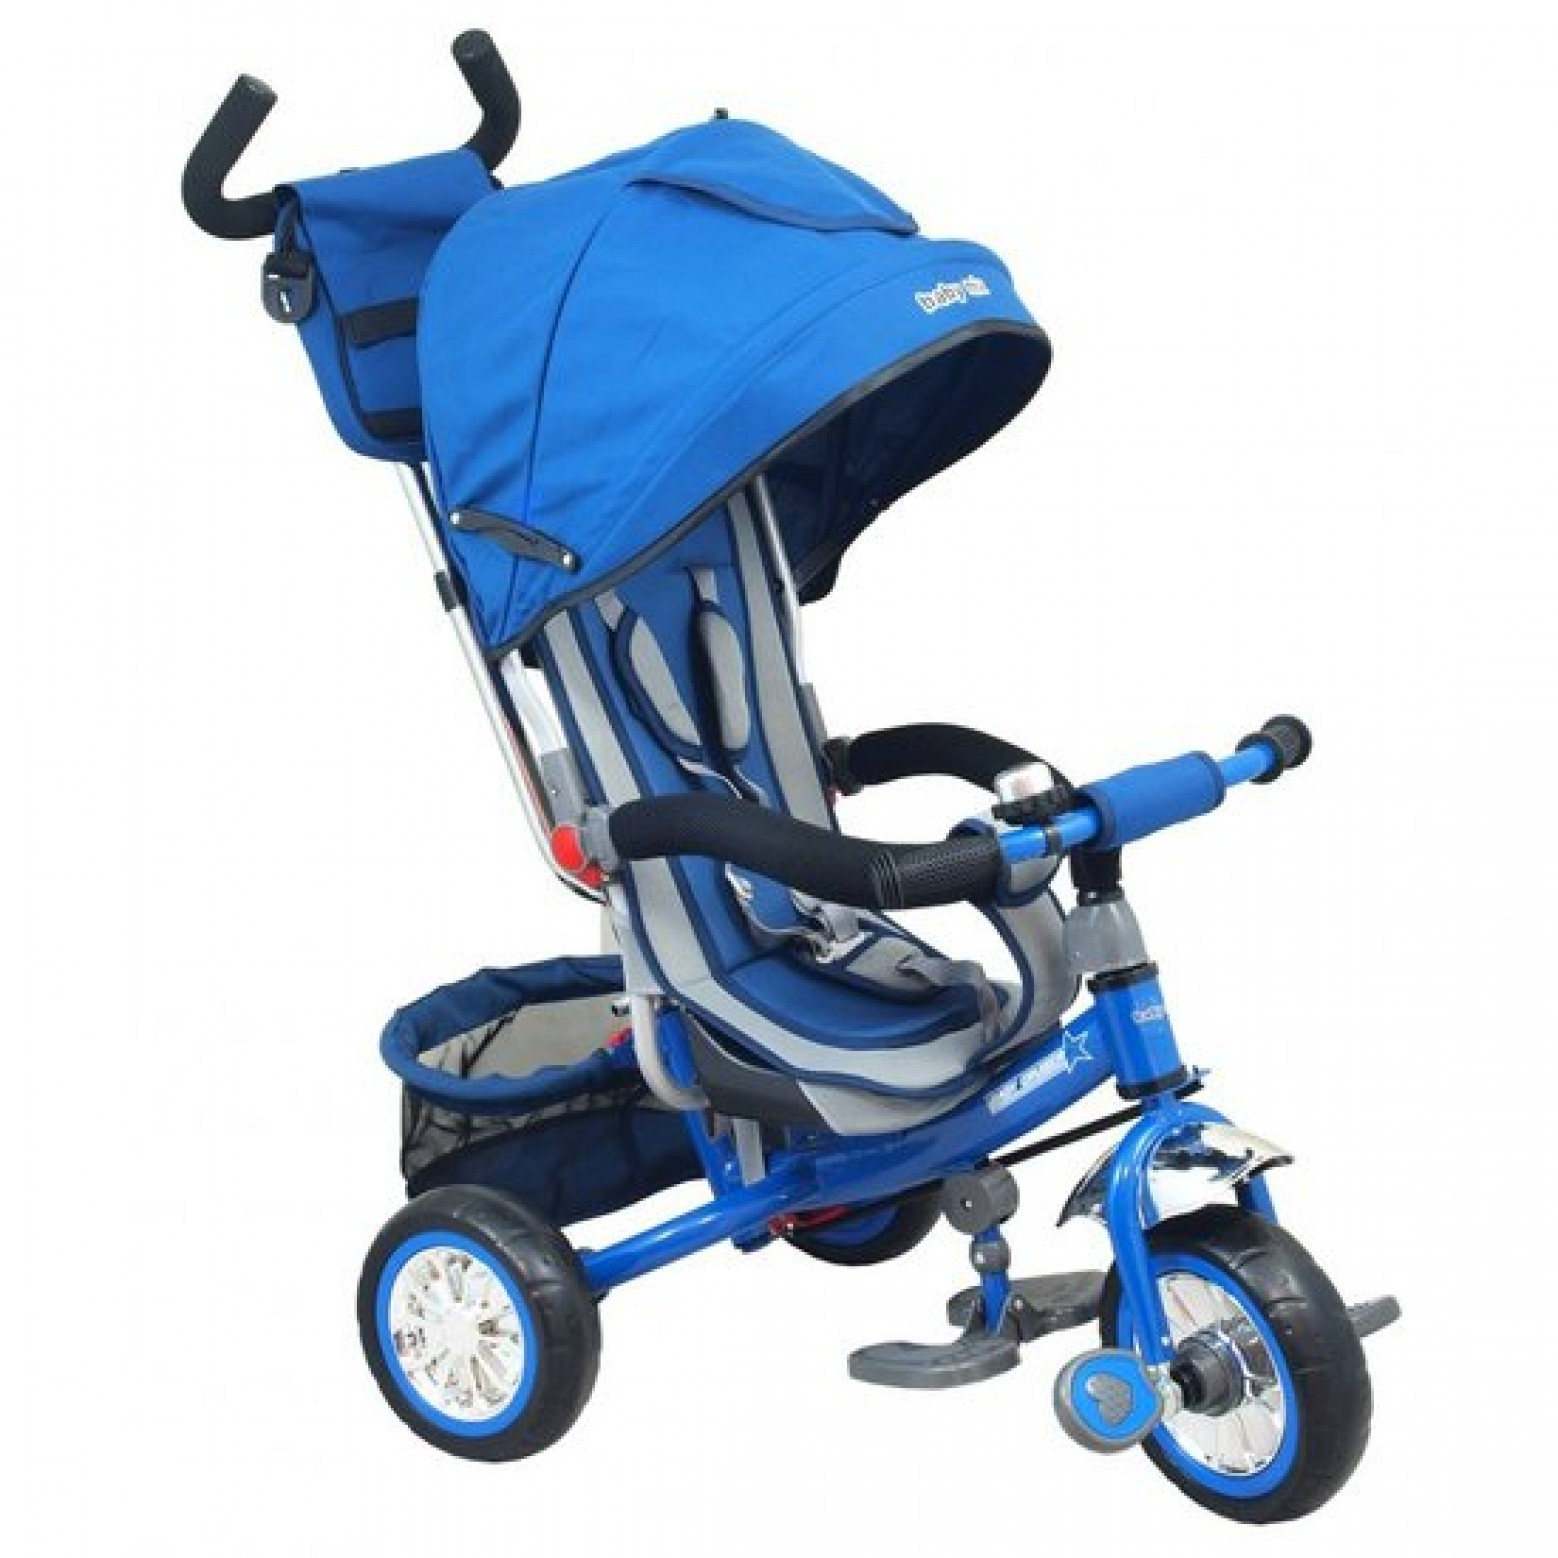 Multifunctionele driewieler in blauw